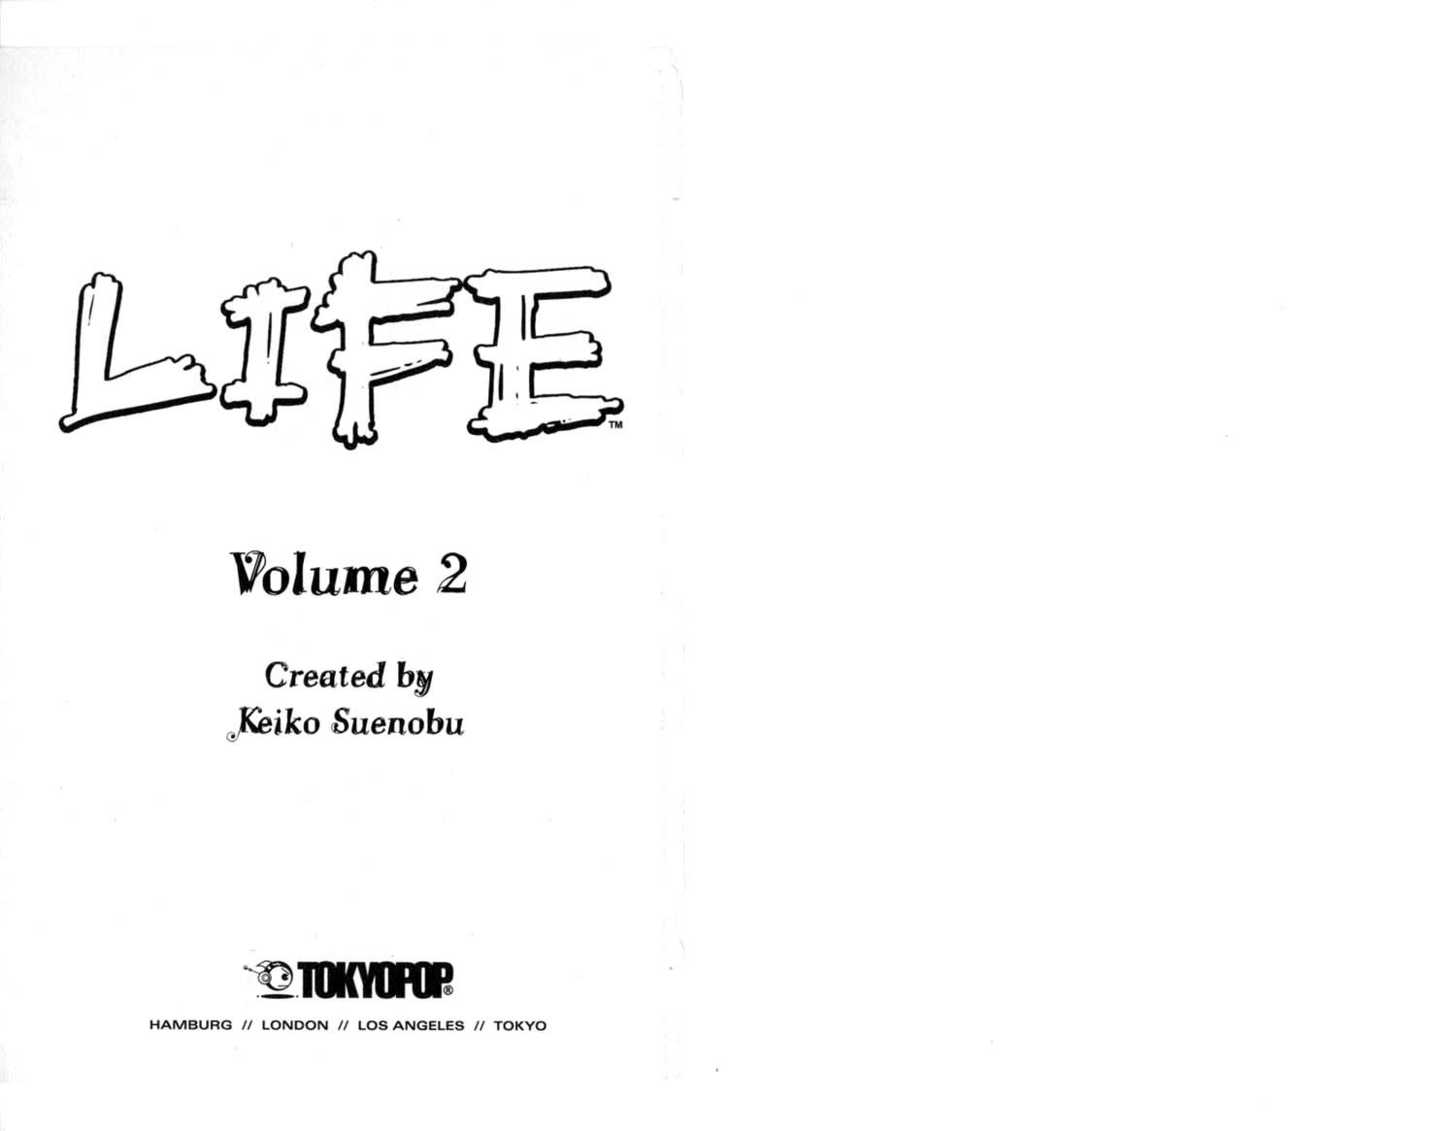 LIFE 0 Page 2